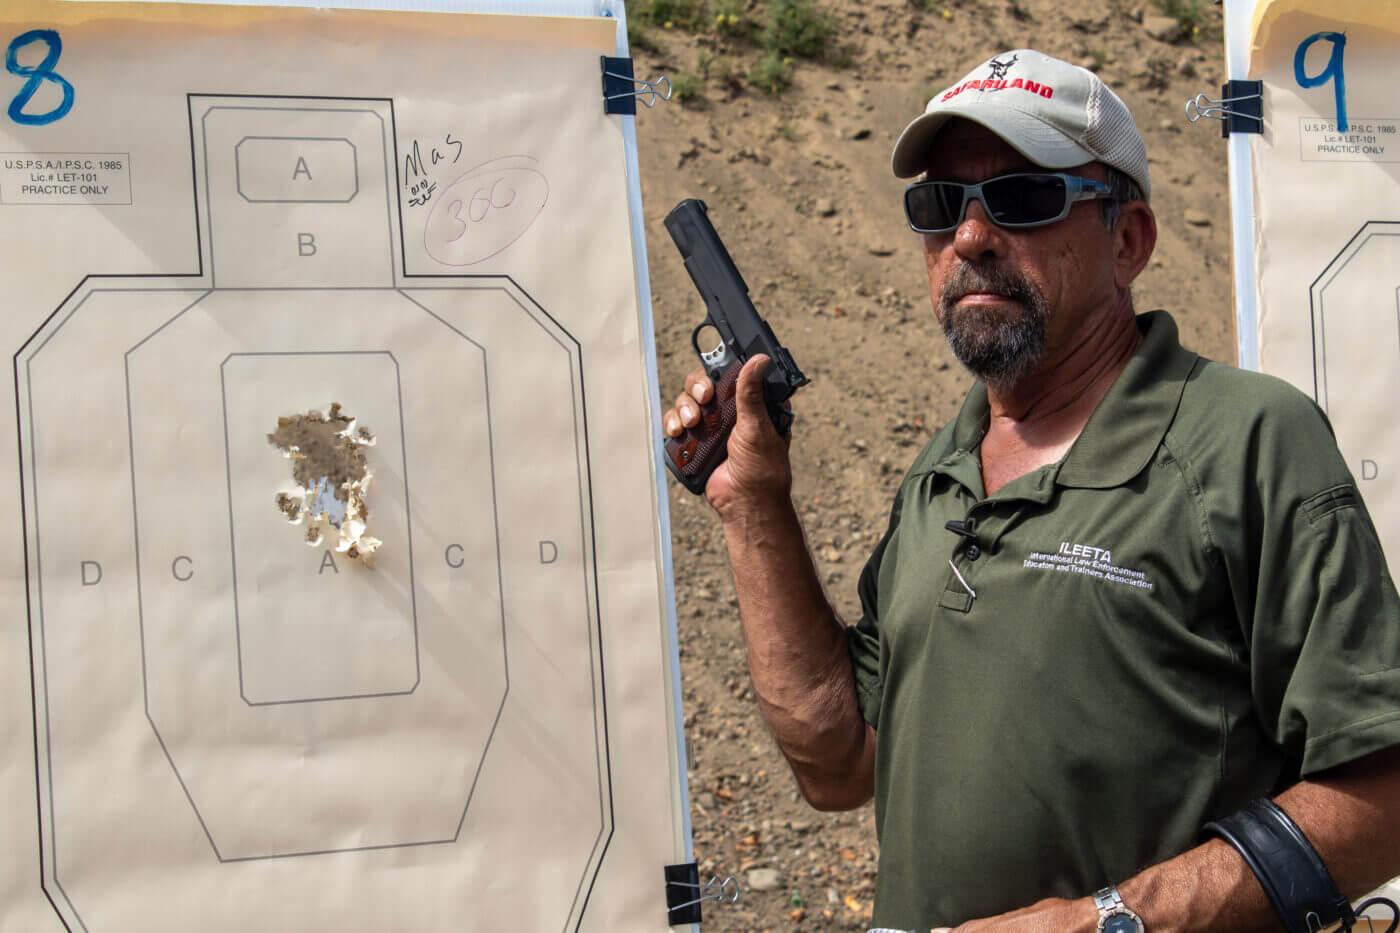 Massad Ayoob with Springfield .45 pistol and ragged target grouping